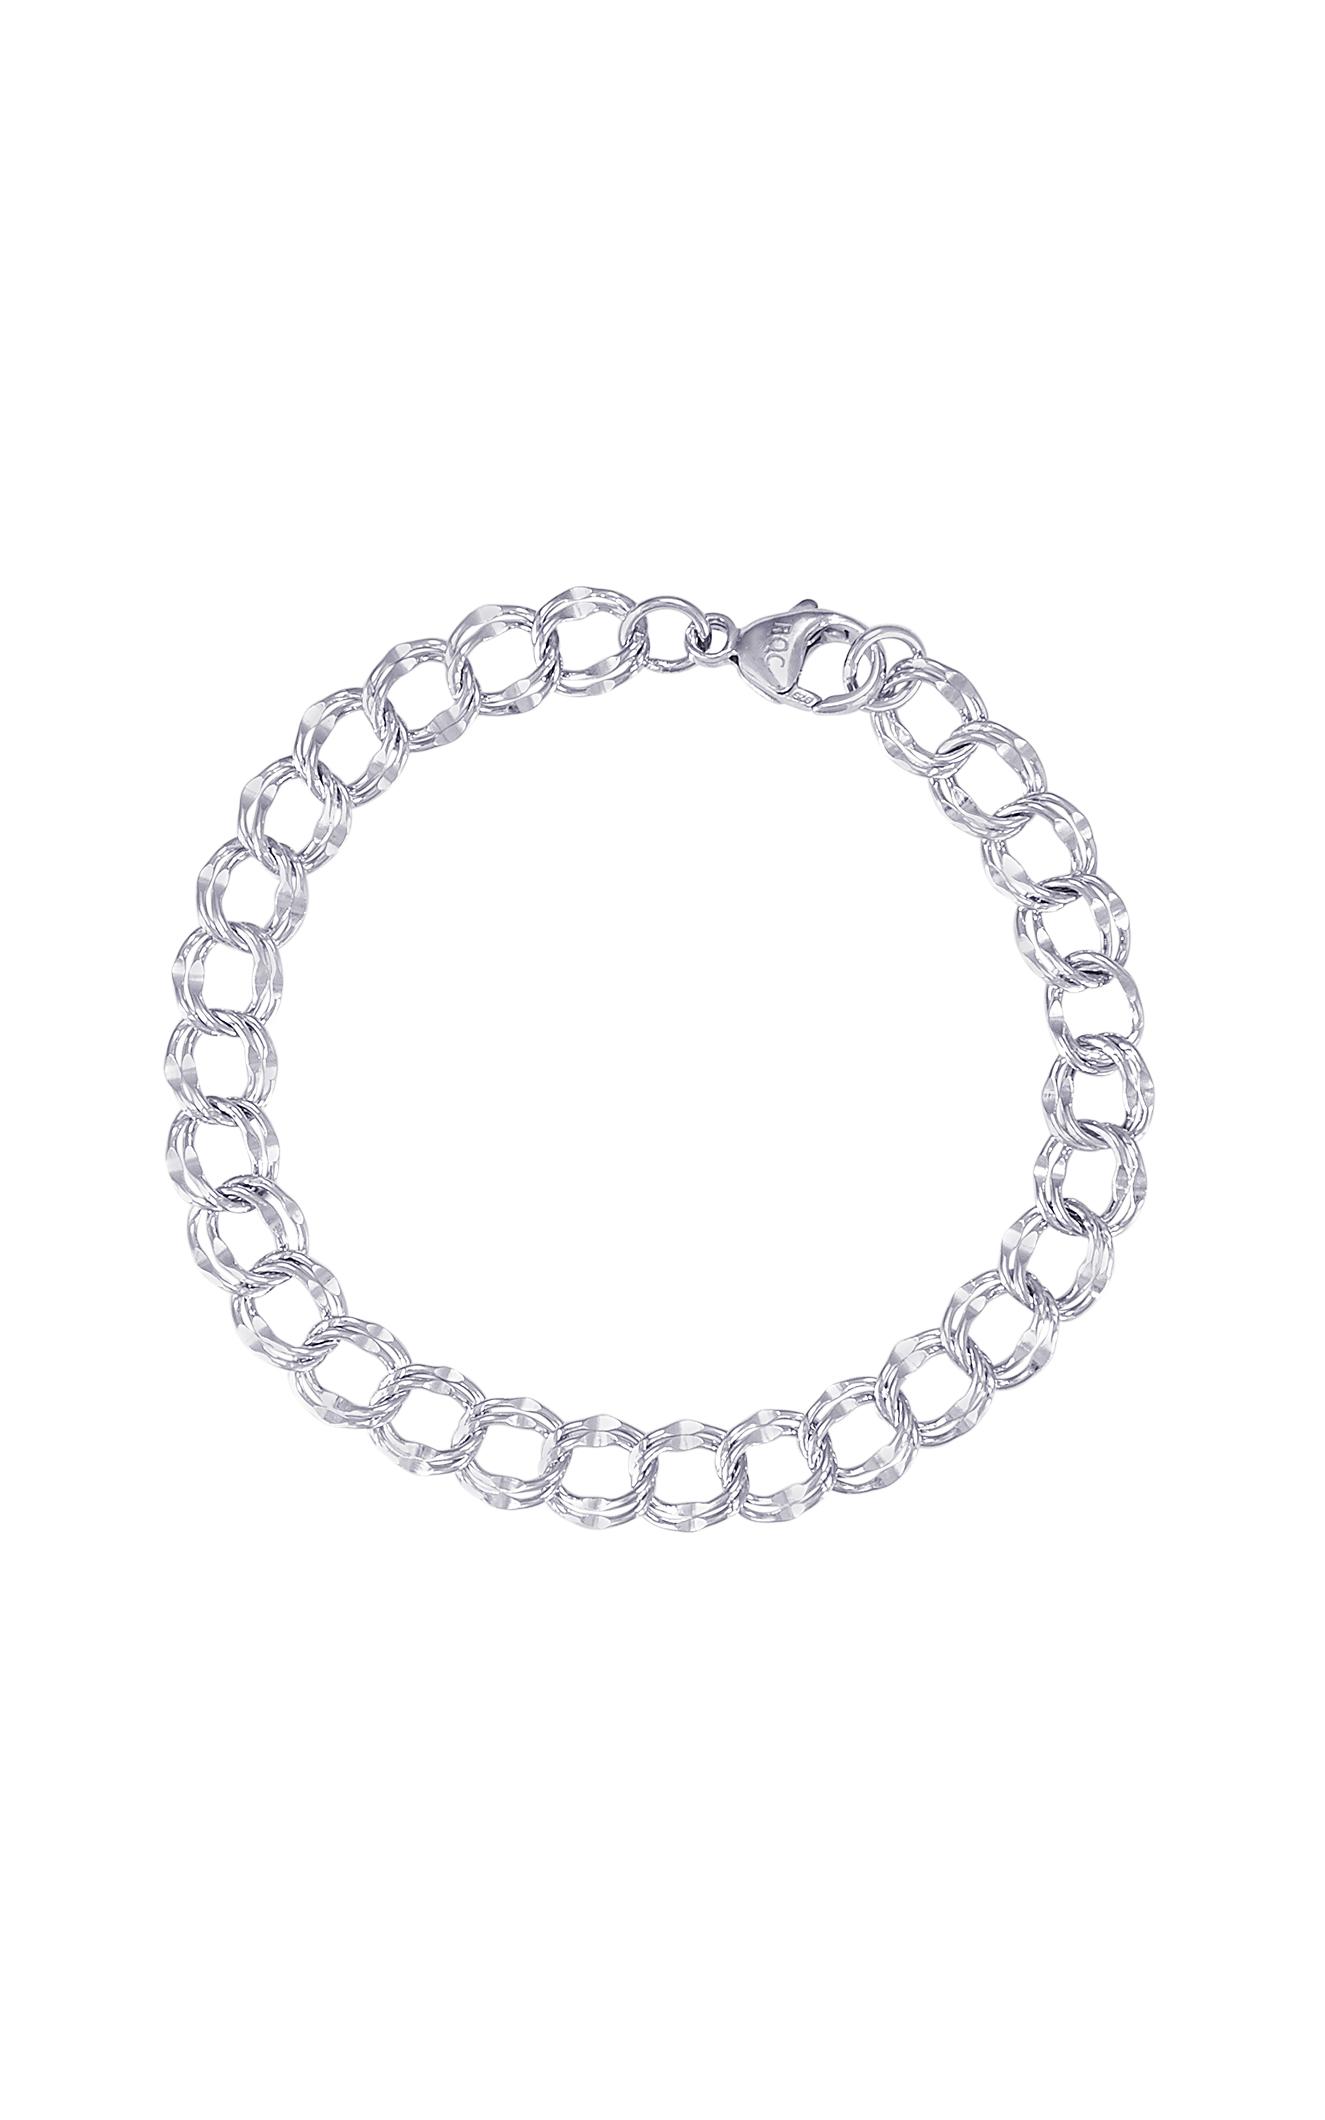 Rembrandt Charms Bracelet 20-0118 product image